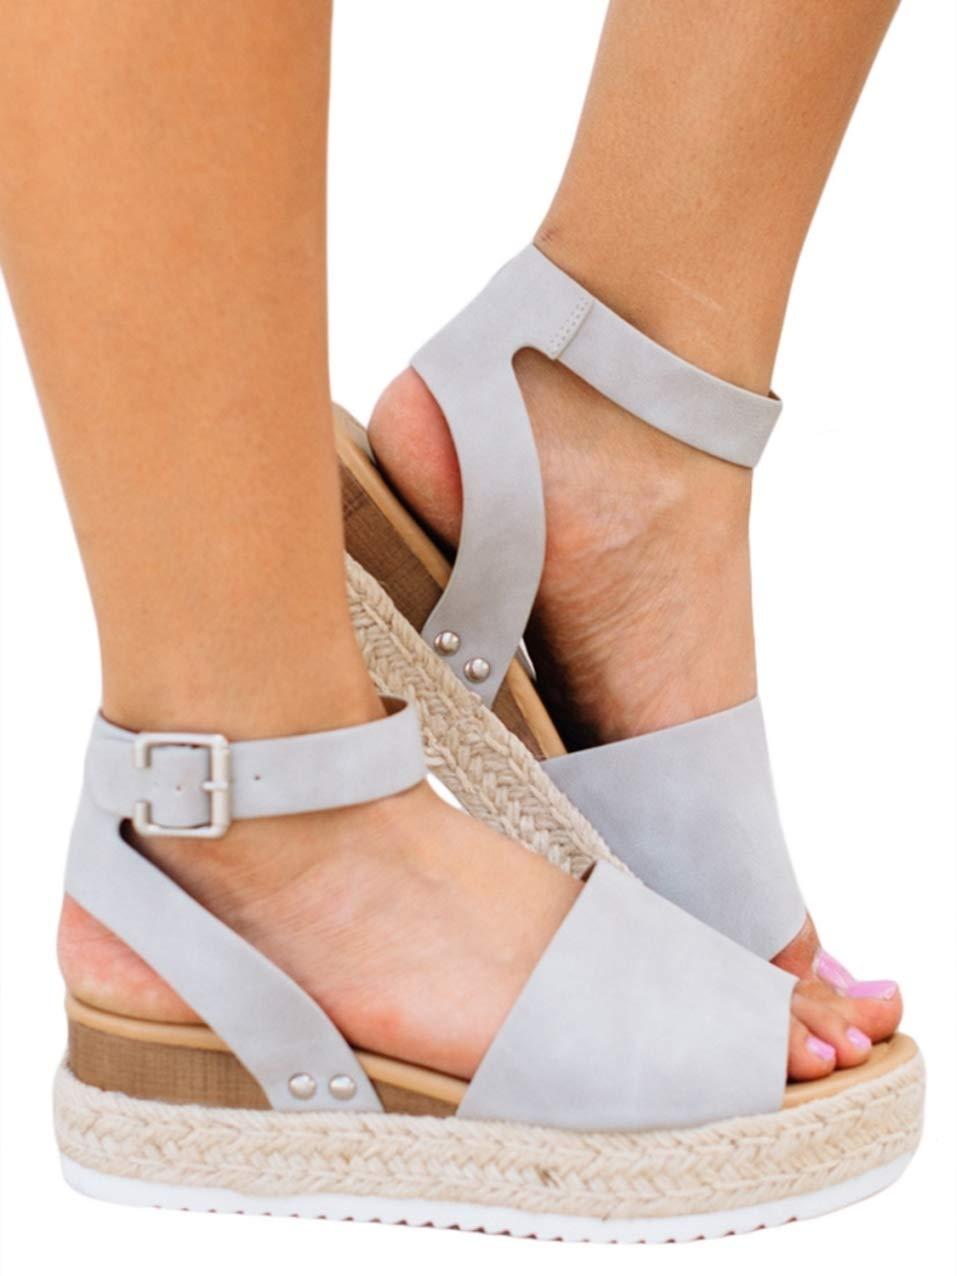 Syktkmx Womens Platform Slingback Sandals Summer Wedge Ankle Strap Open Toe Espadrilles Grey